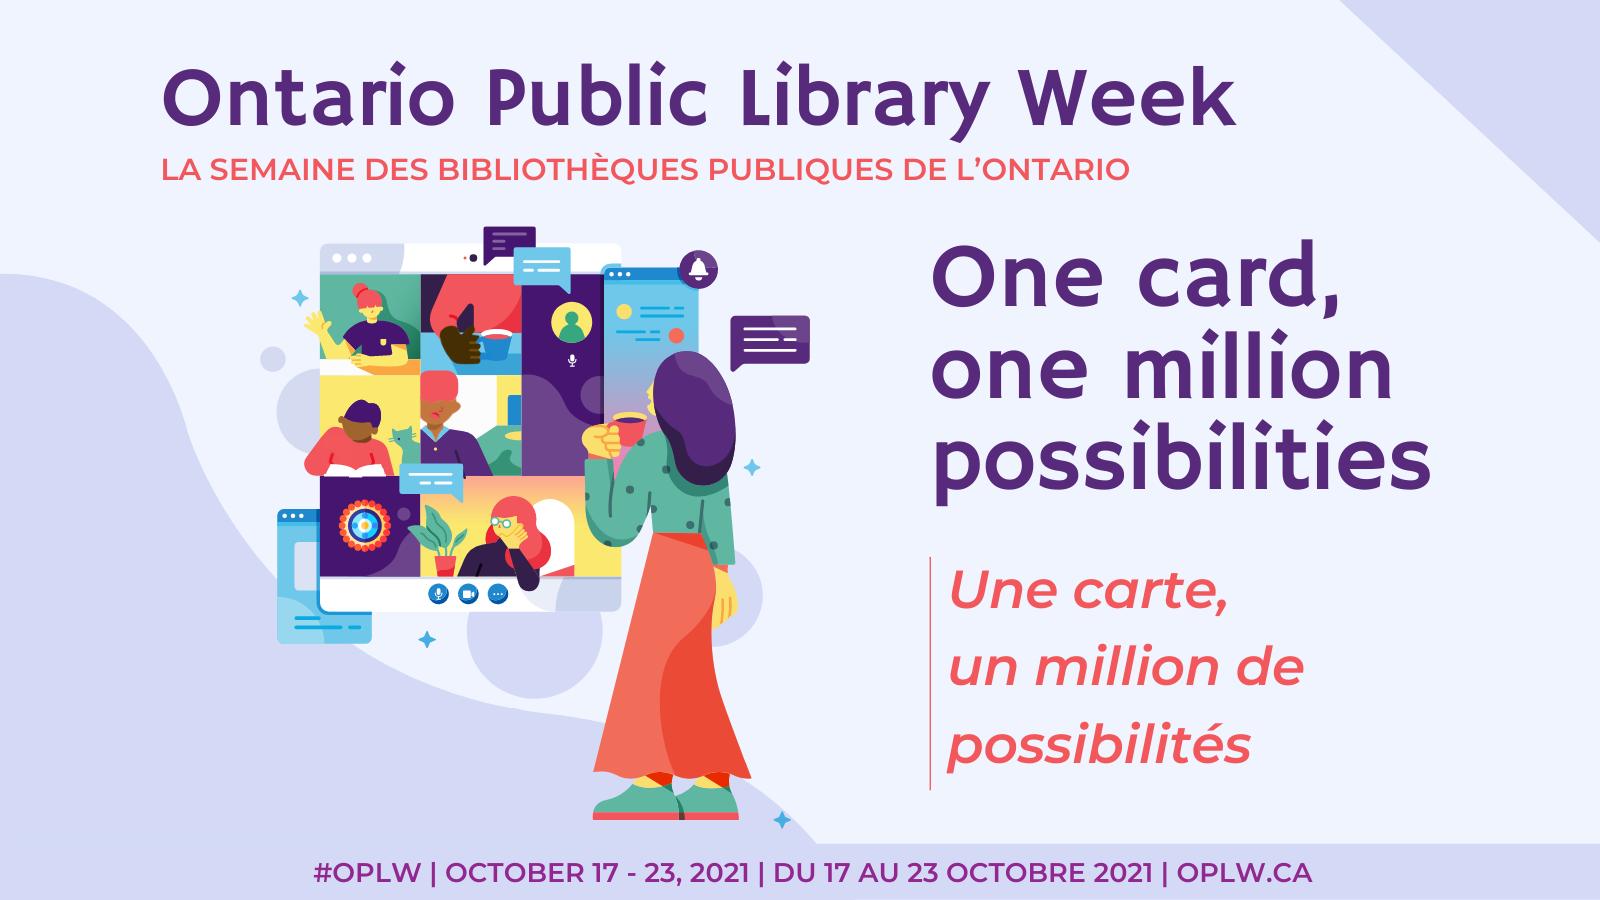 Ontario Public Library Week 2021